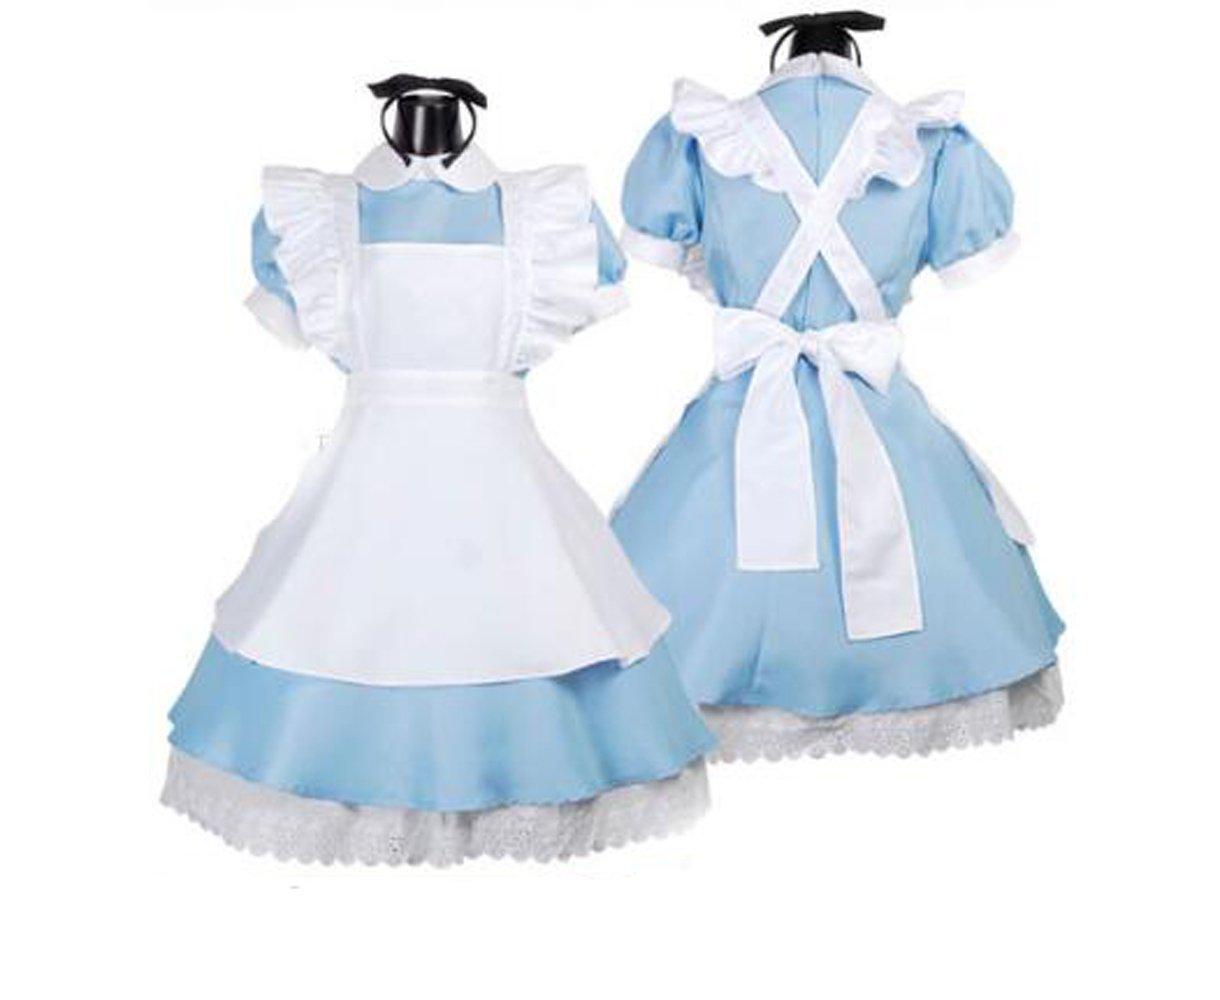 Zhiqing Blue Alices Wonderland Lolita Maid Cosplay Costumes Fancy Dress Sets Kits Apron Size M